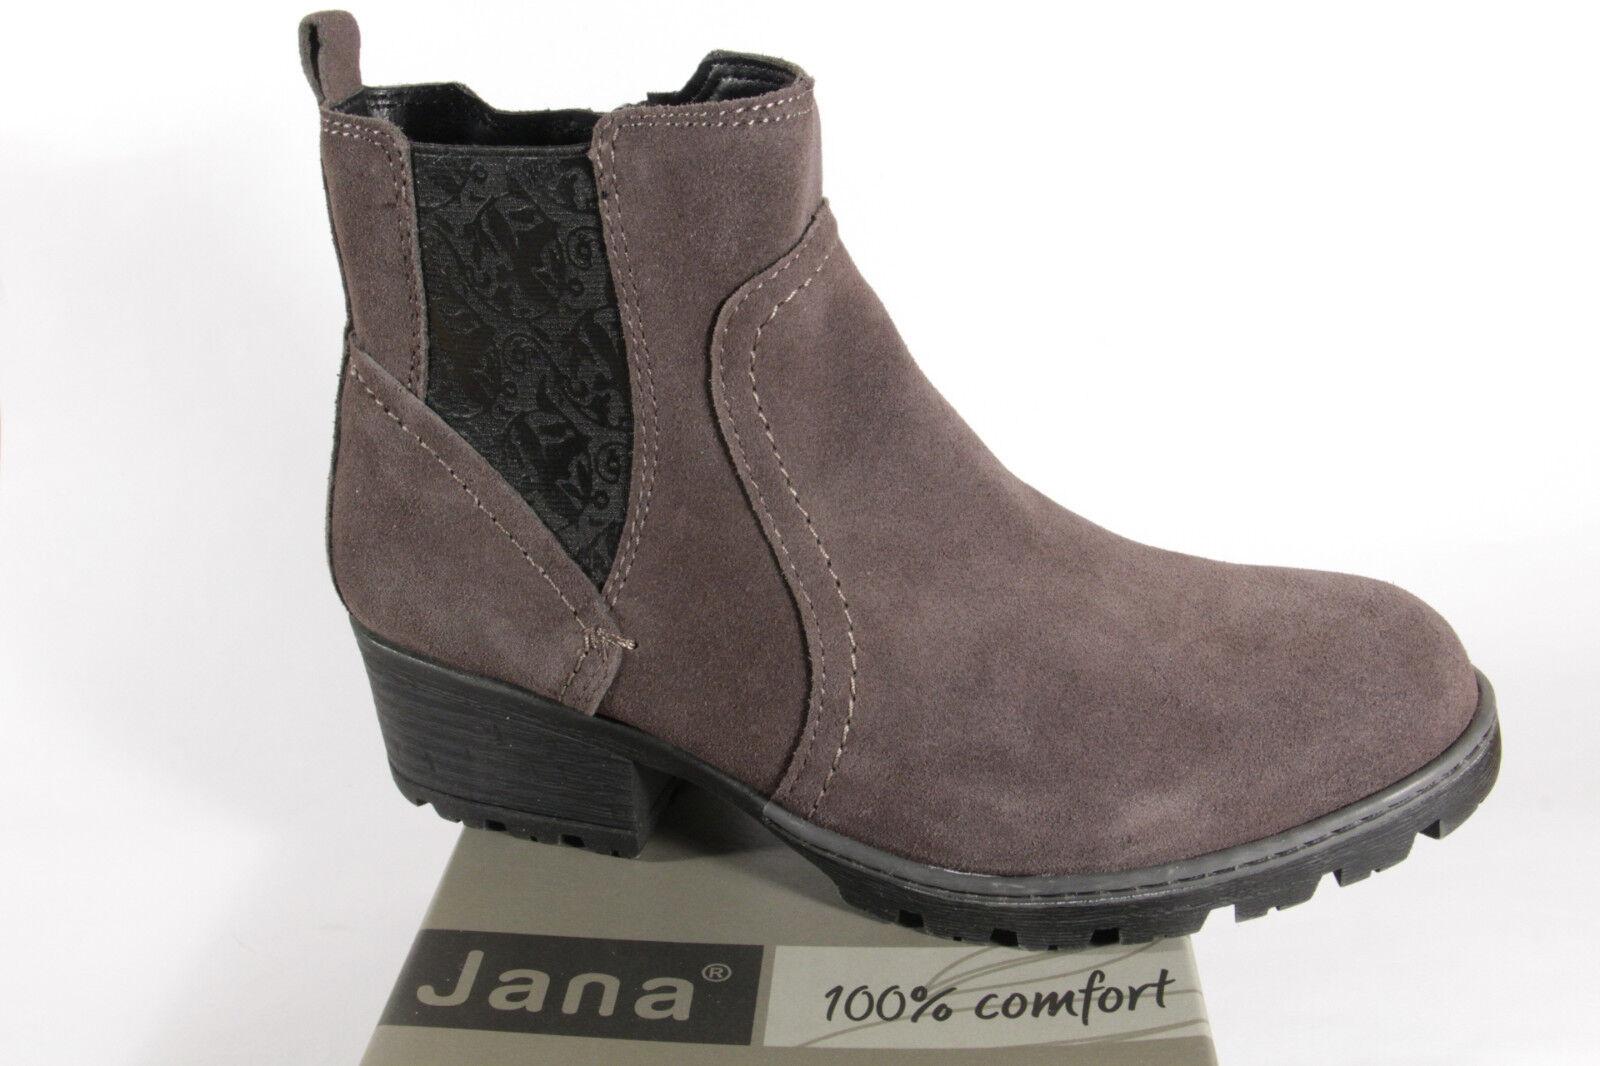 Zapatos especiales con descuento Jana 25404 Damen Stiefel, Stiefeletten Boots Echtleder grau NEU!